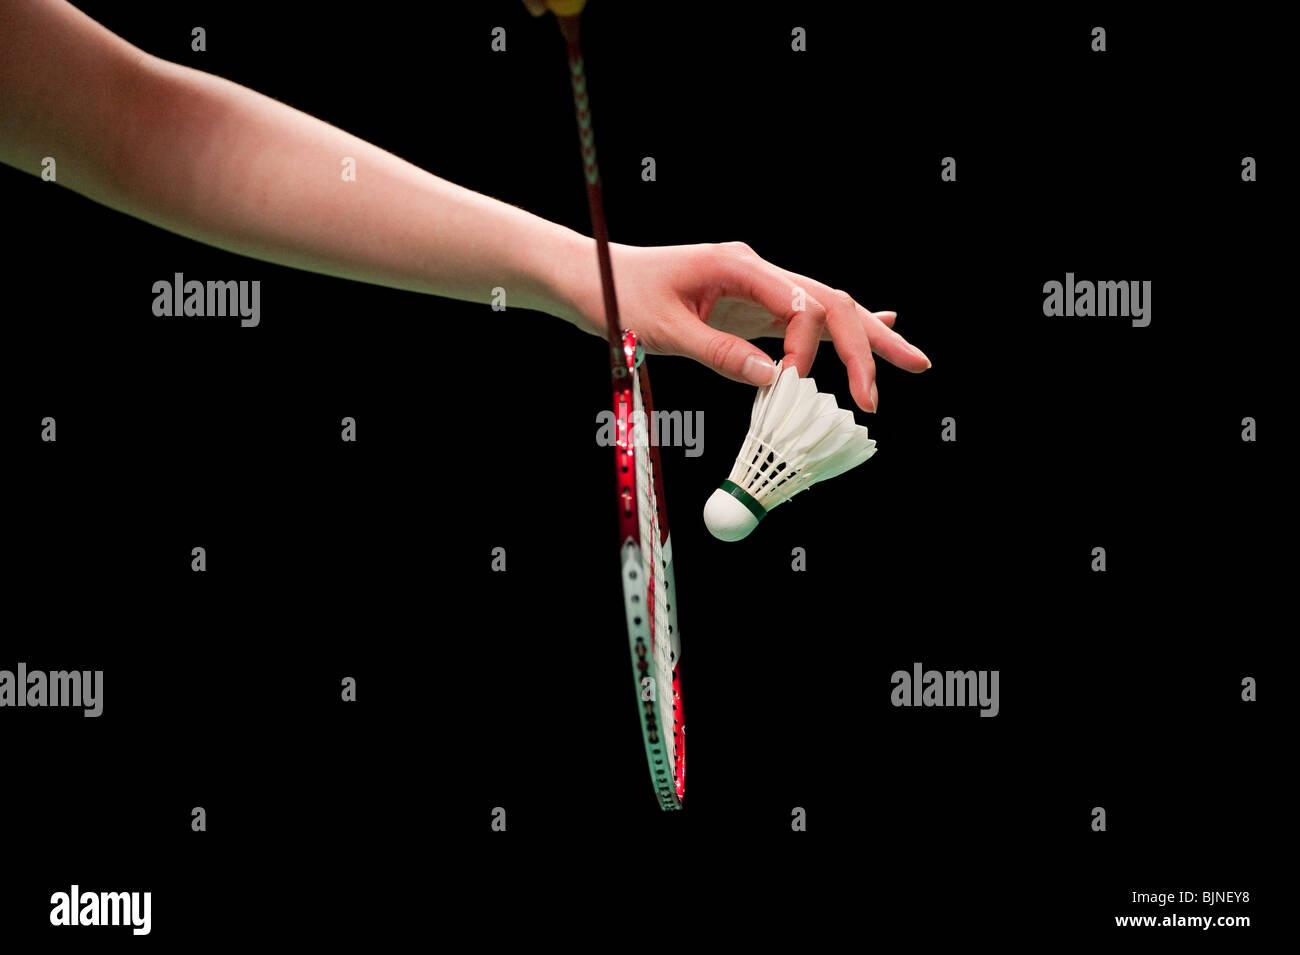 A badminton player prepares to serve a shuttlecock - Stock Image